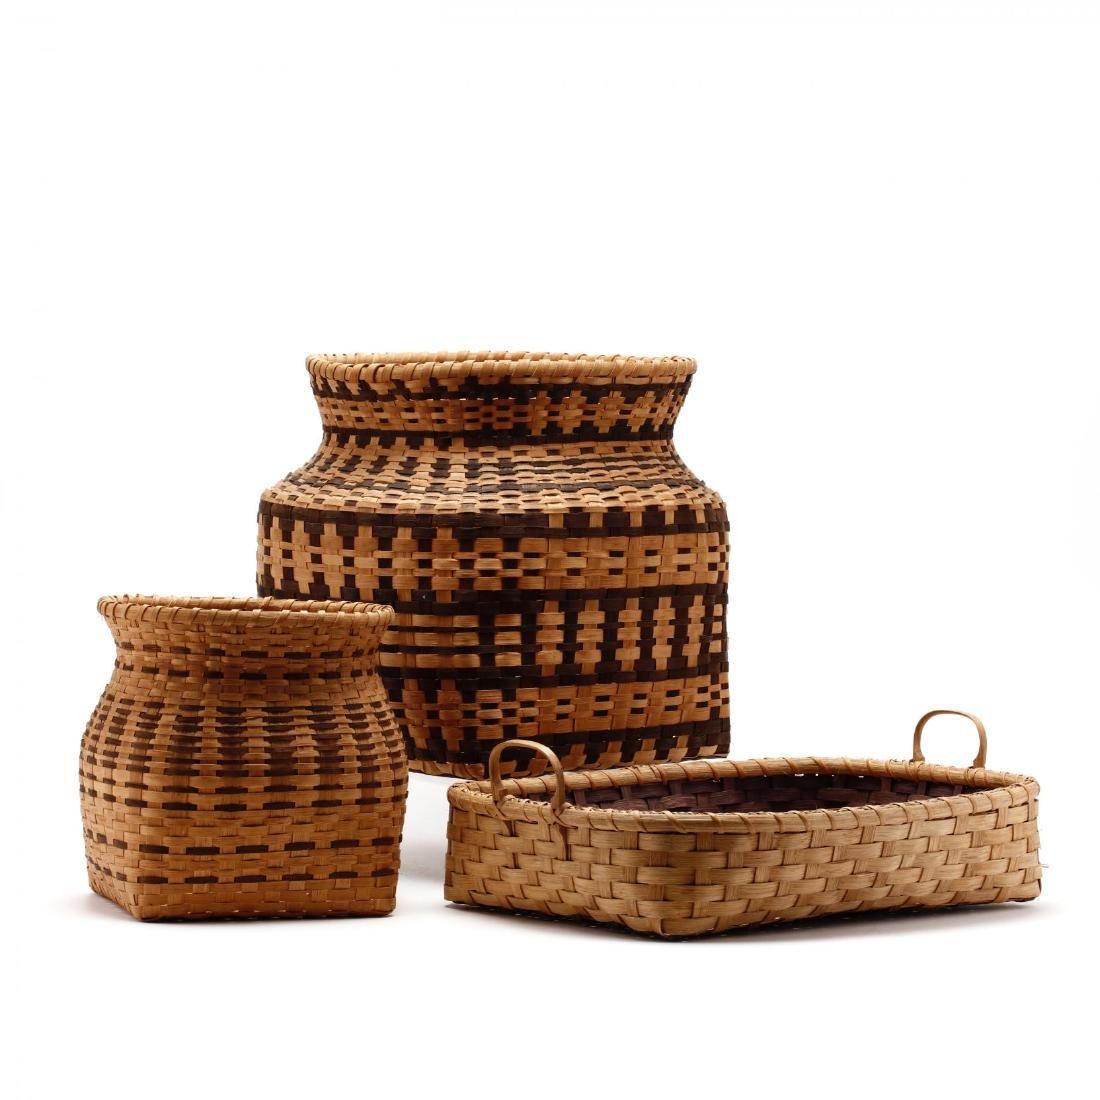 Three Native American Baskets - 2